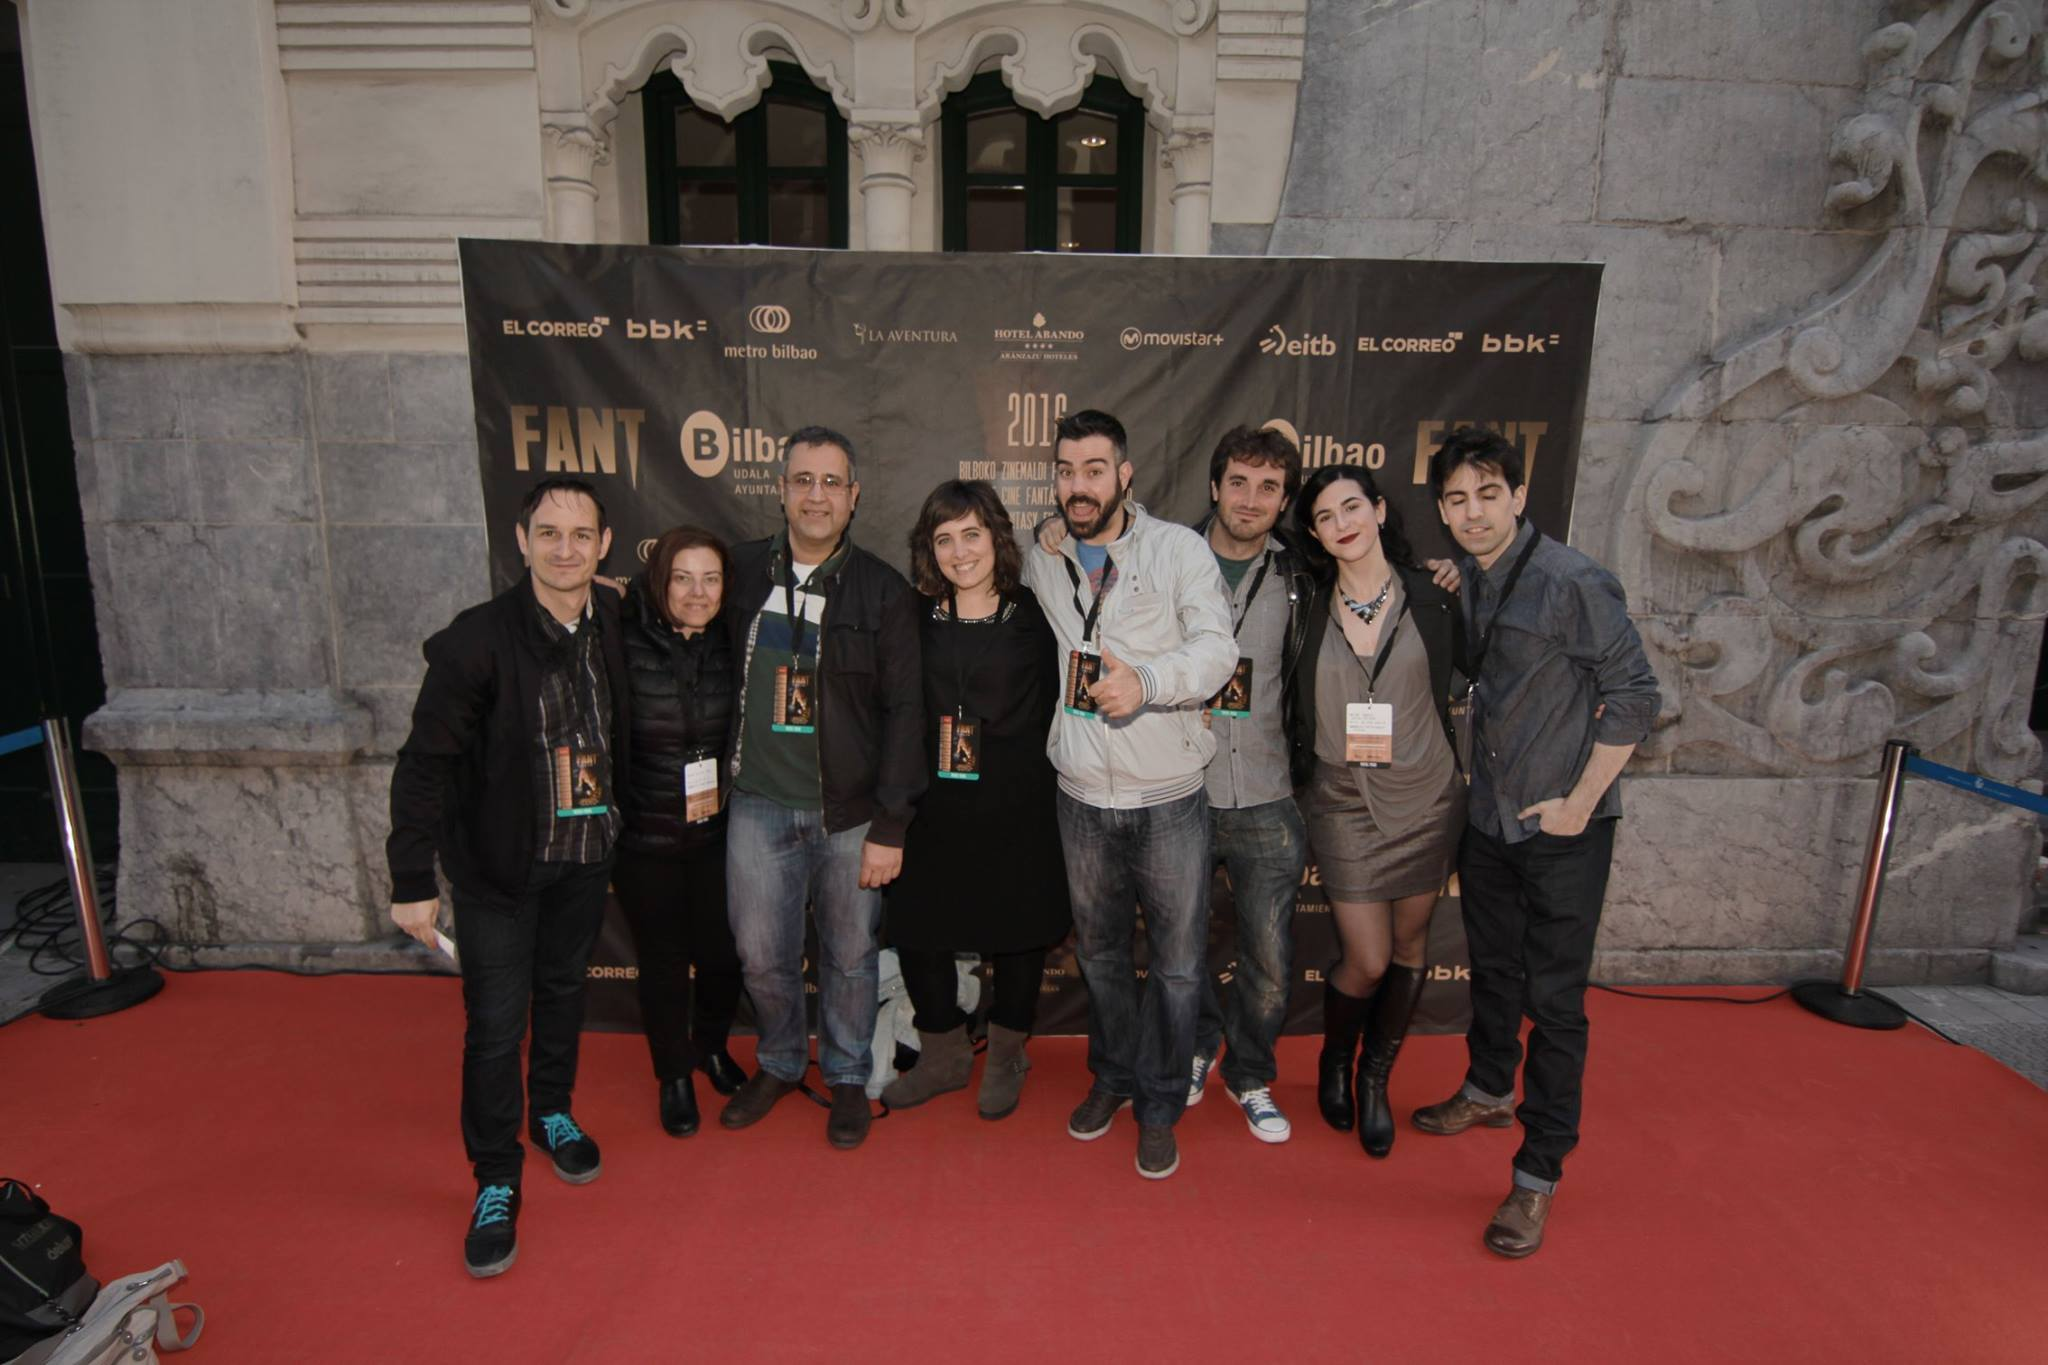 Fant Bilbao Fantasy Film Festival